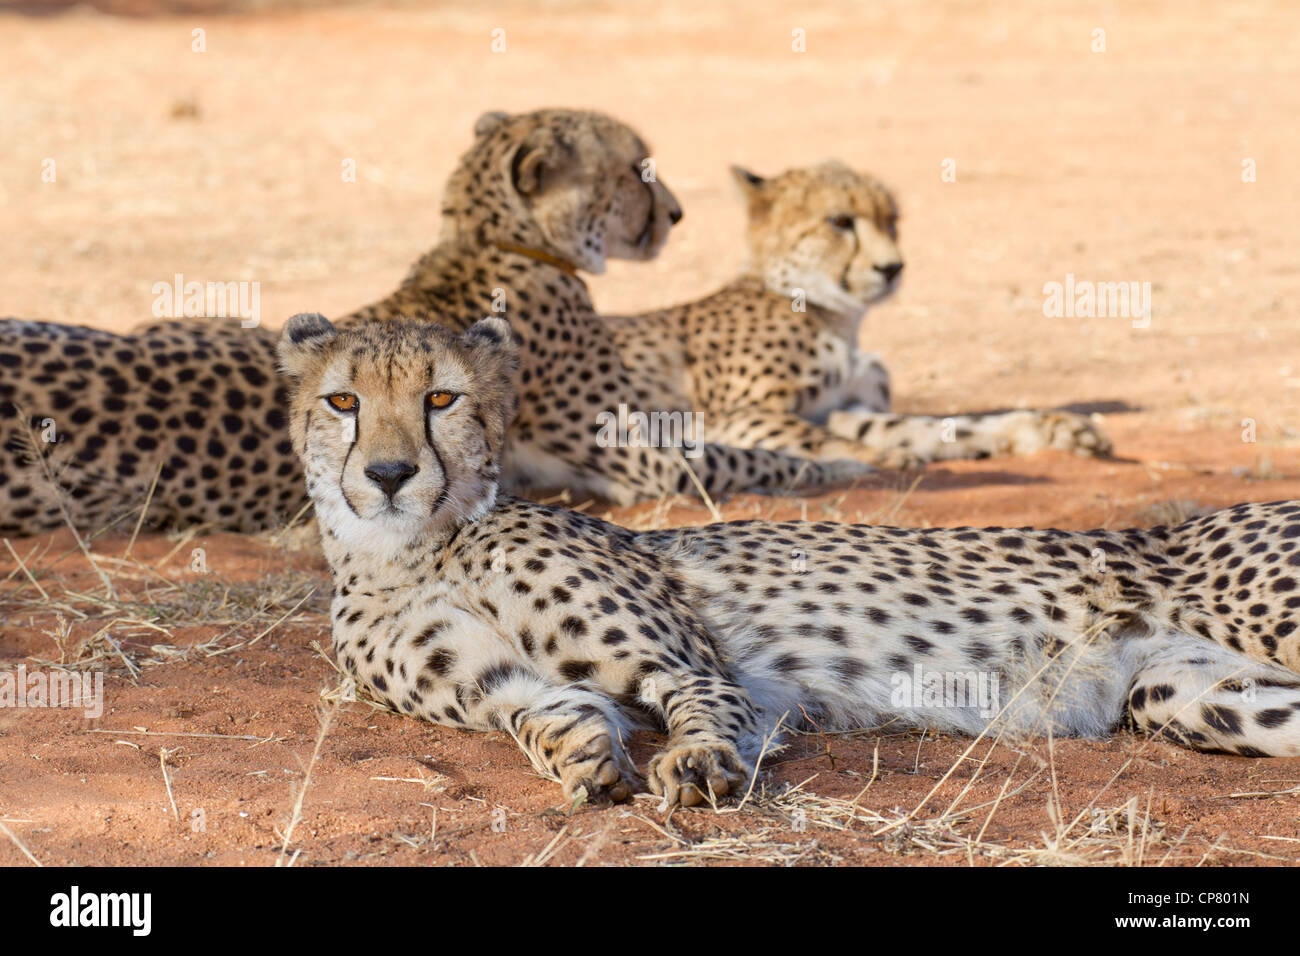 Cheetah group, (Acinonyx jubatus), South Africa - Stock Image